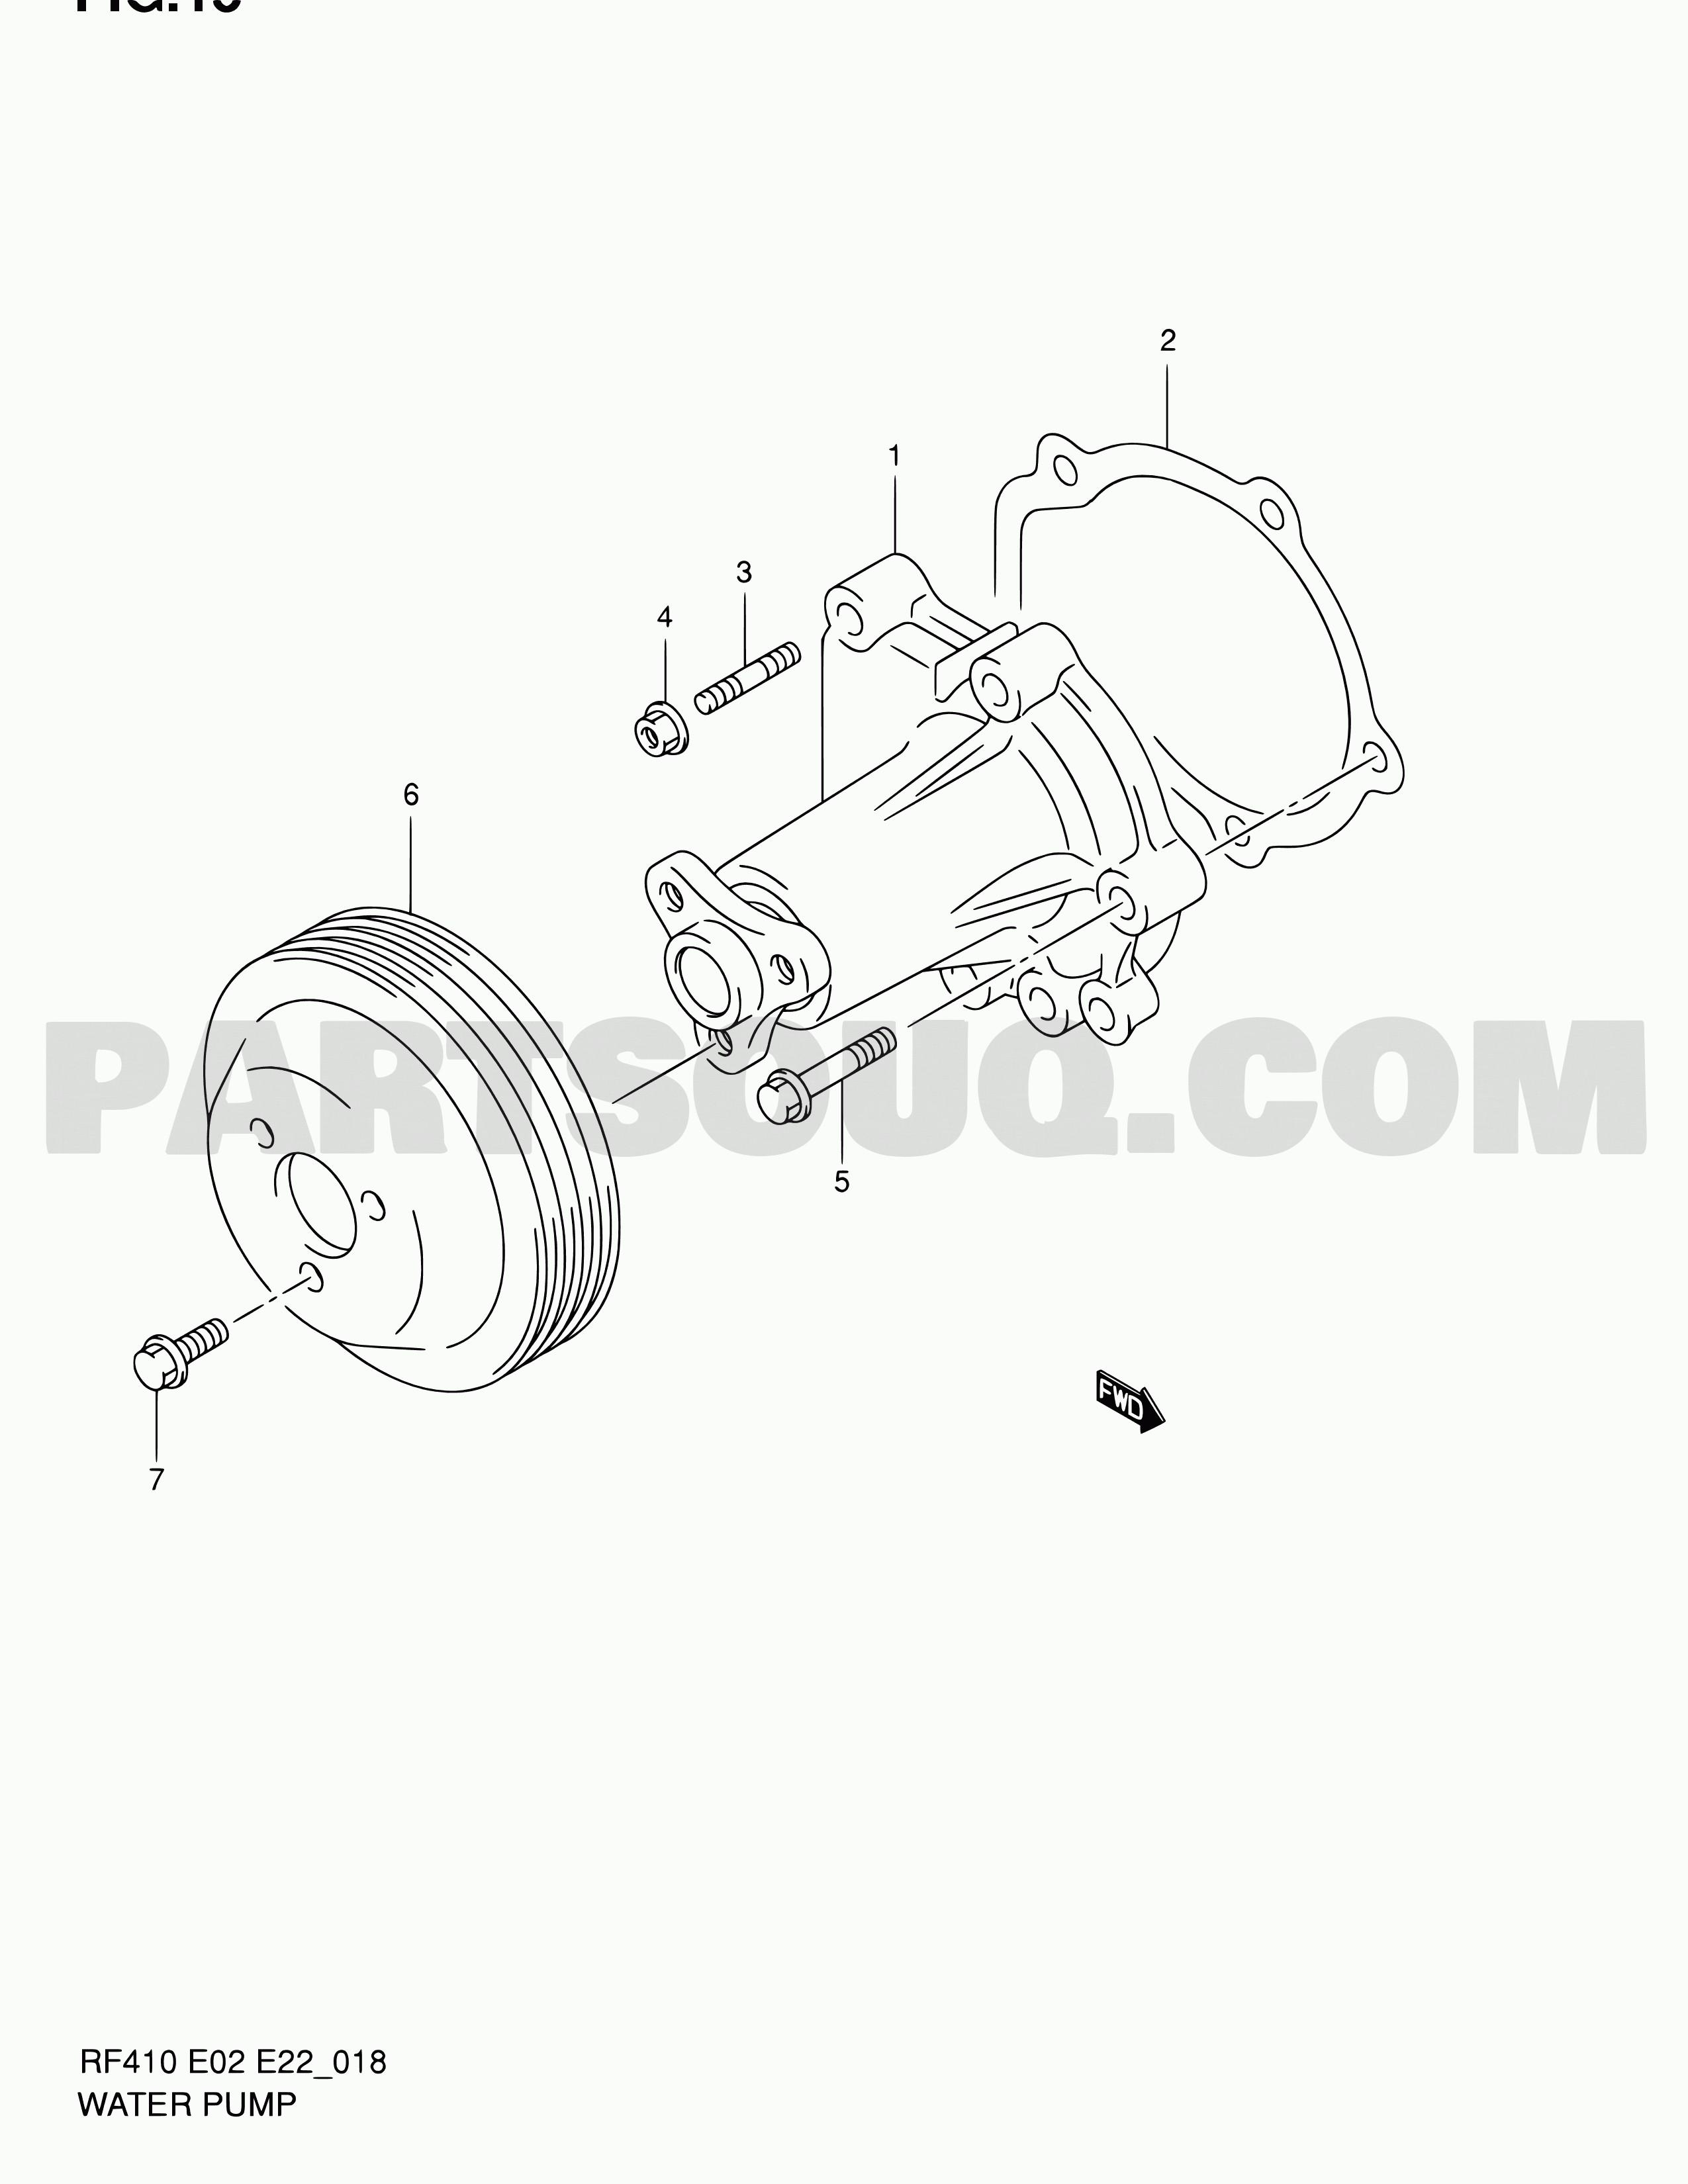 Maruti Suzuki 800 Engine Diagram 18 Water Pump Of Maruti Suzuki 800 Engine Diagram